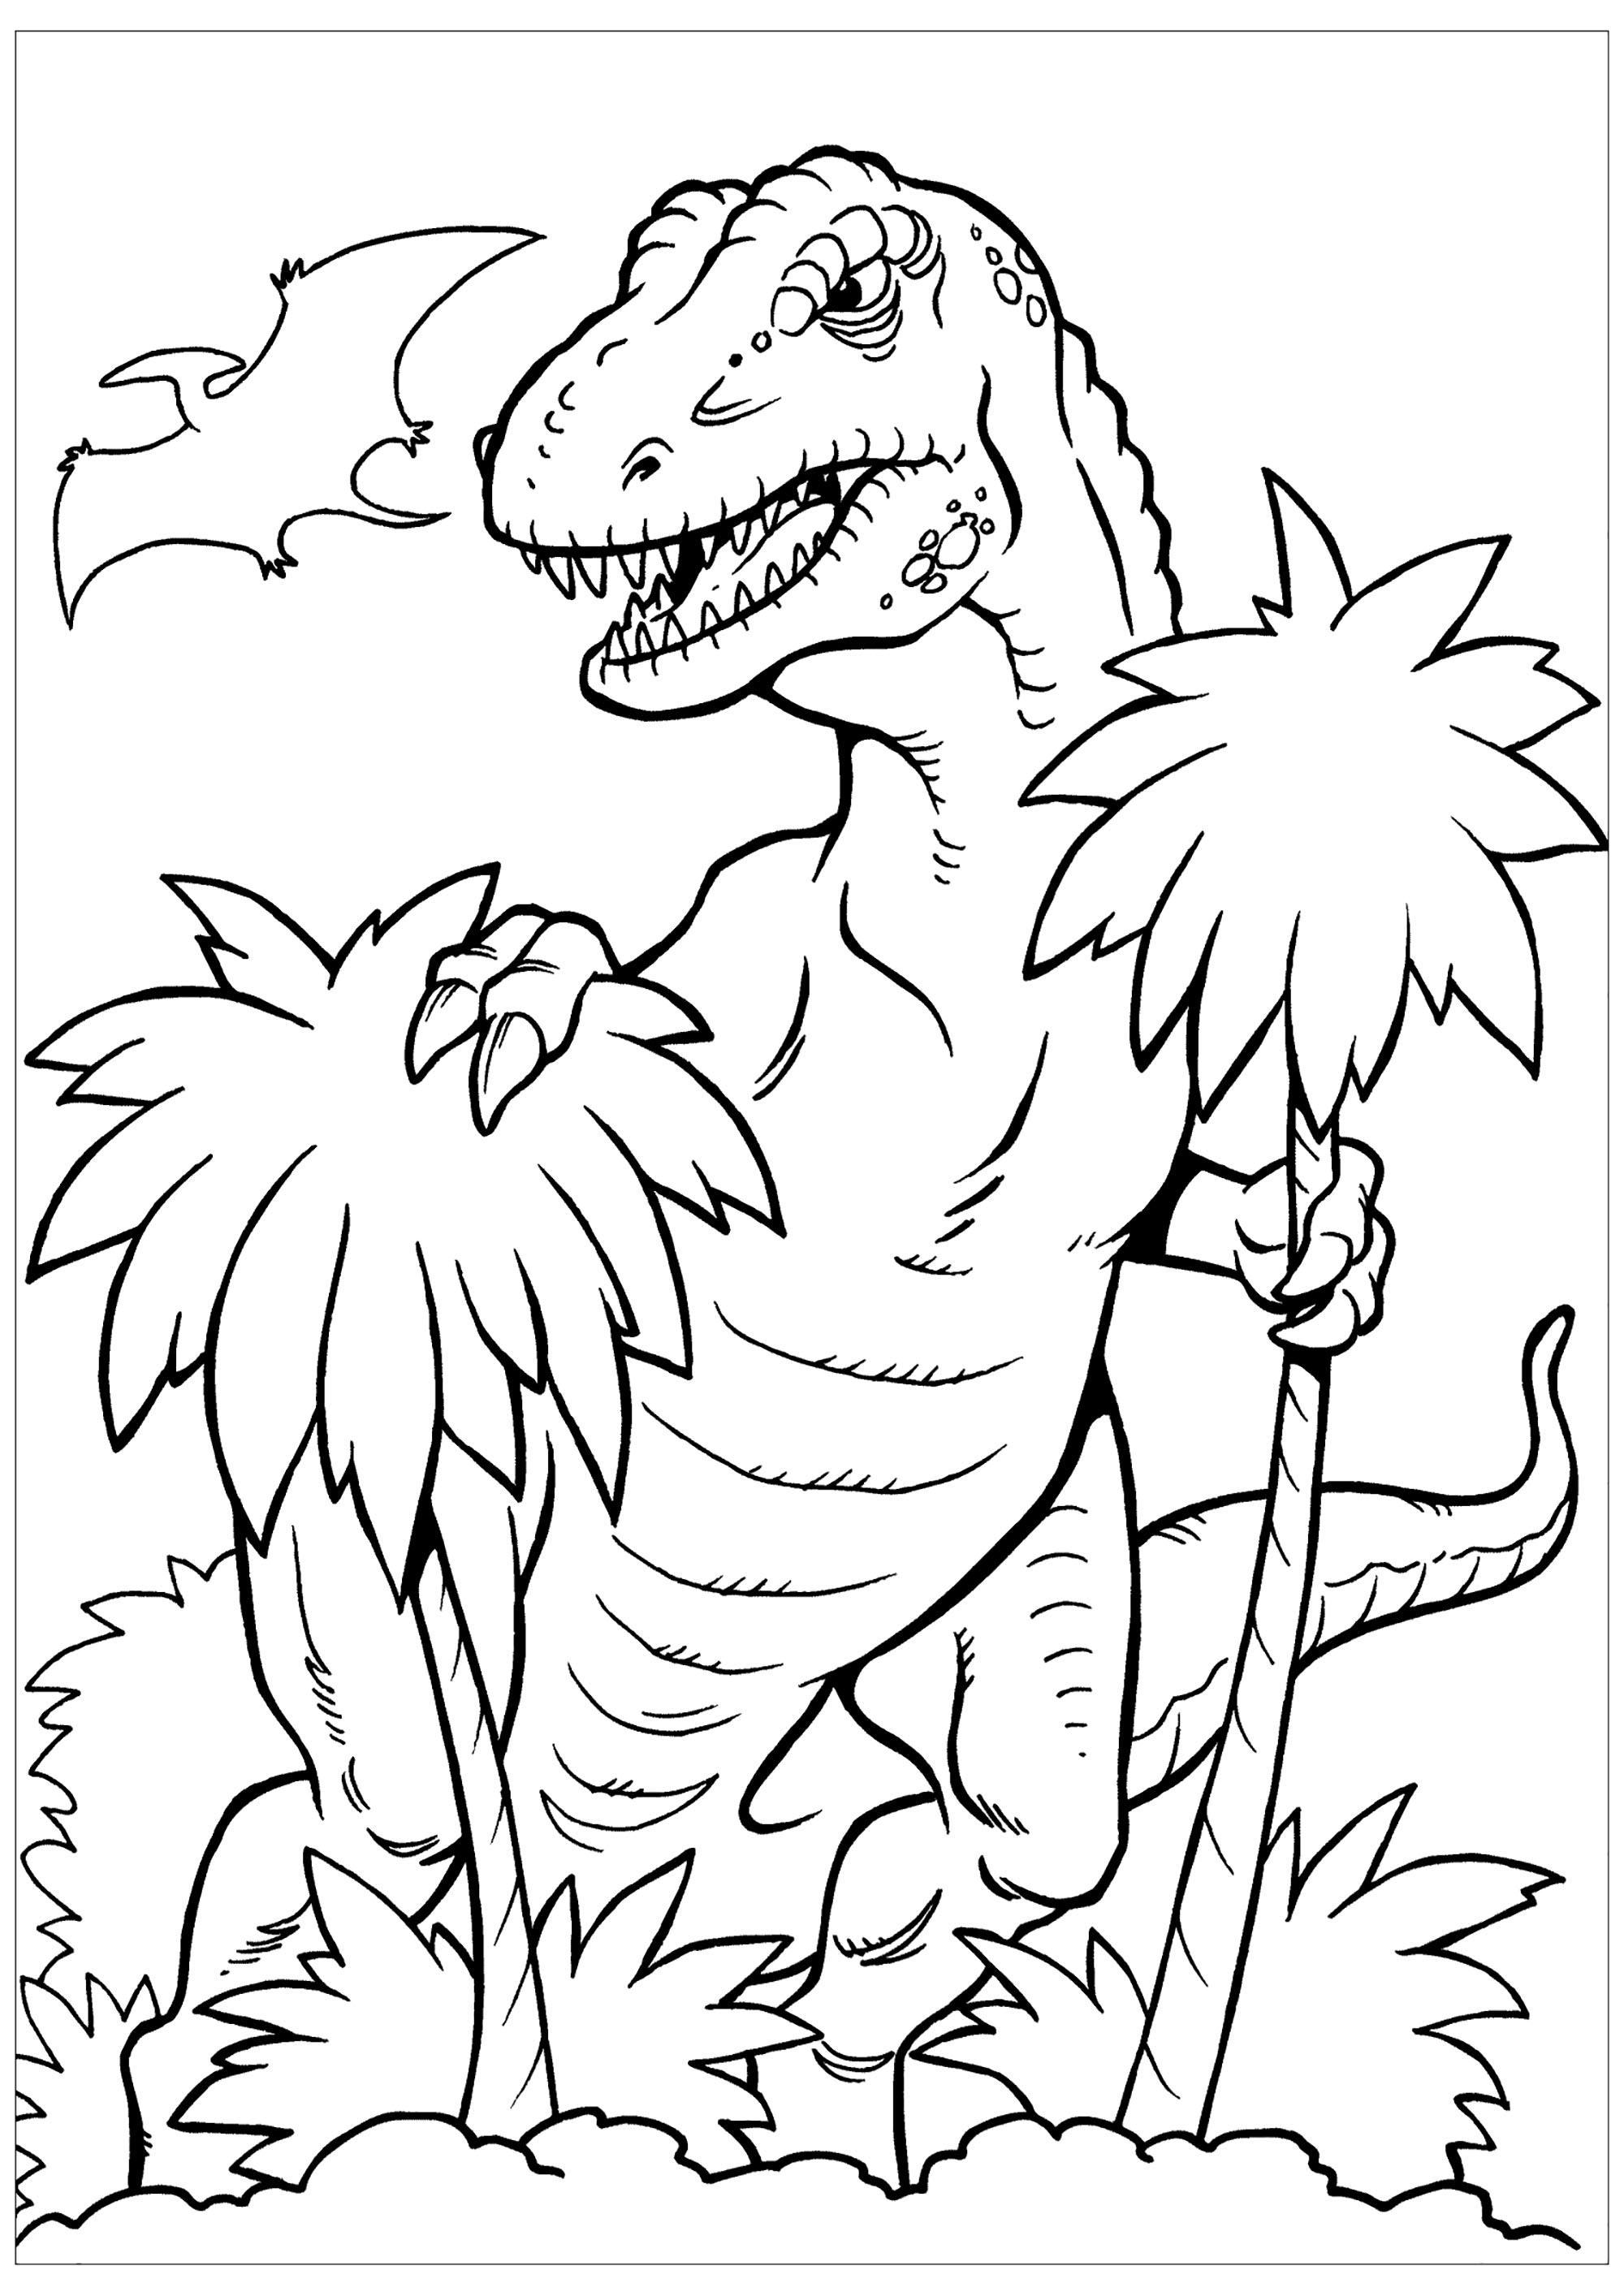 Jurassic world - Coloriages de dinosaures - Coloriages ...